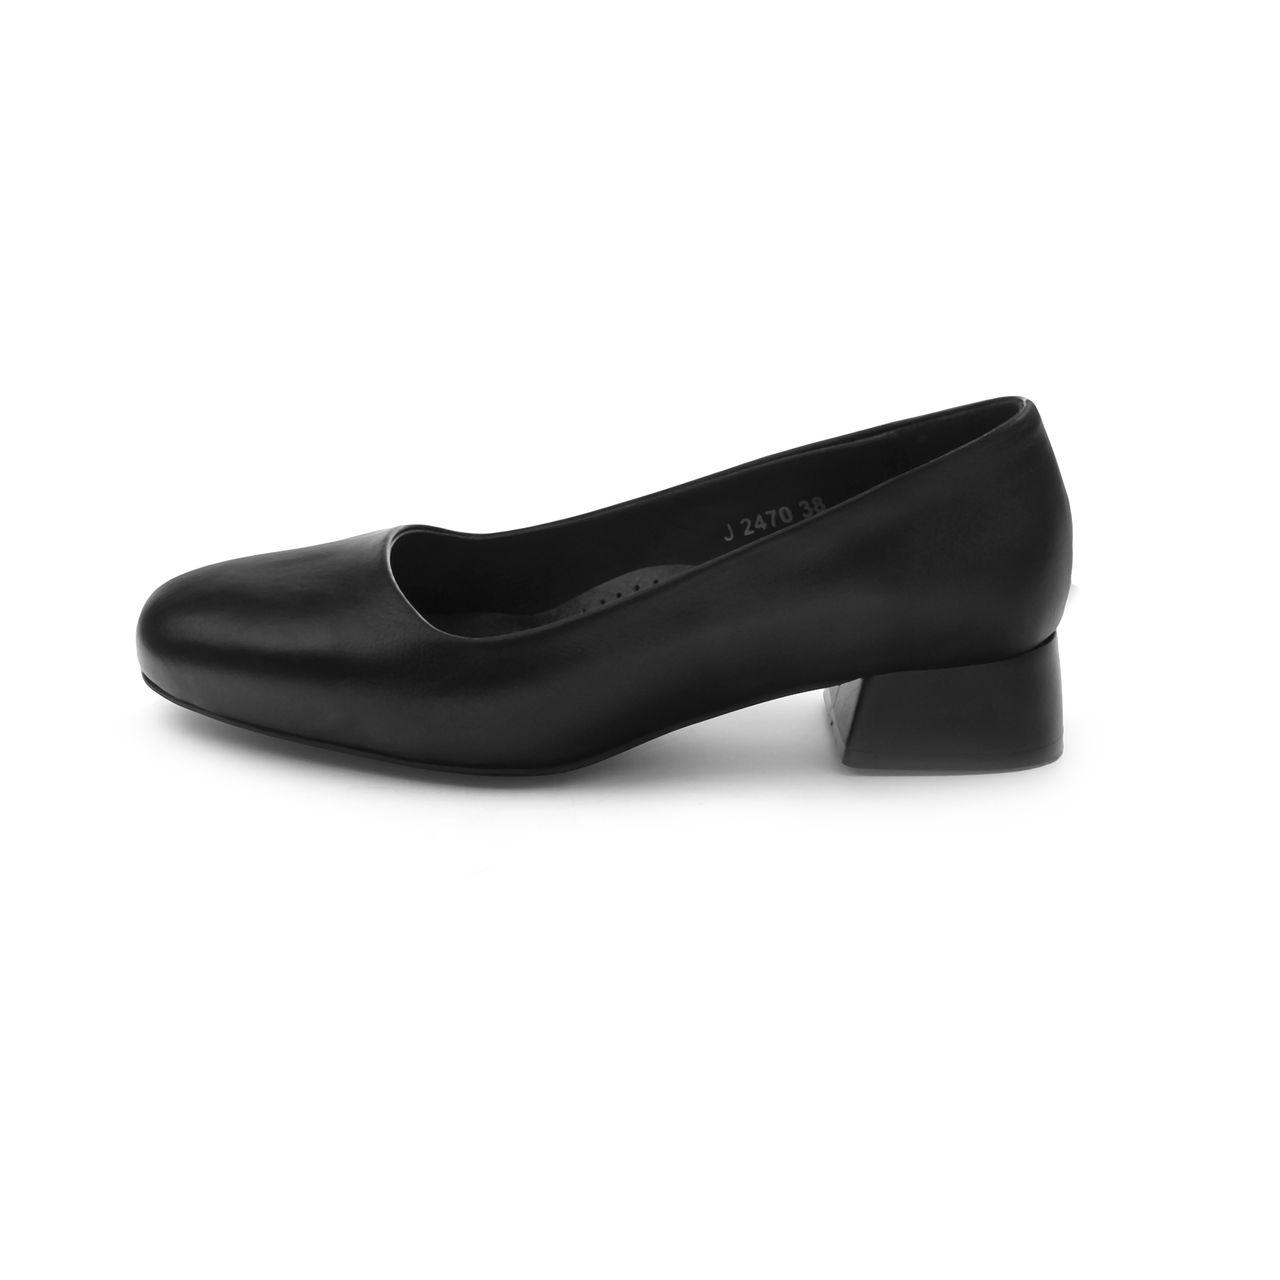 کفش زنانه چرم مشهد مدل J2470001